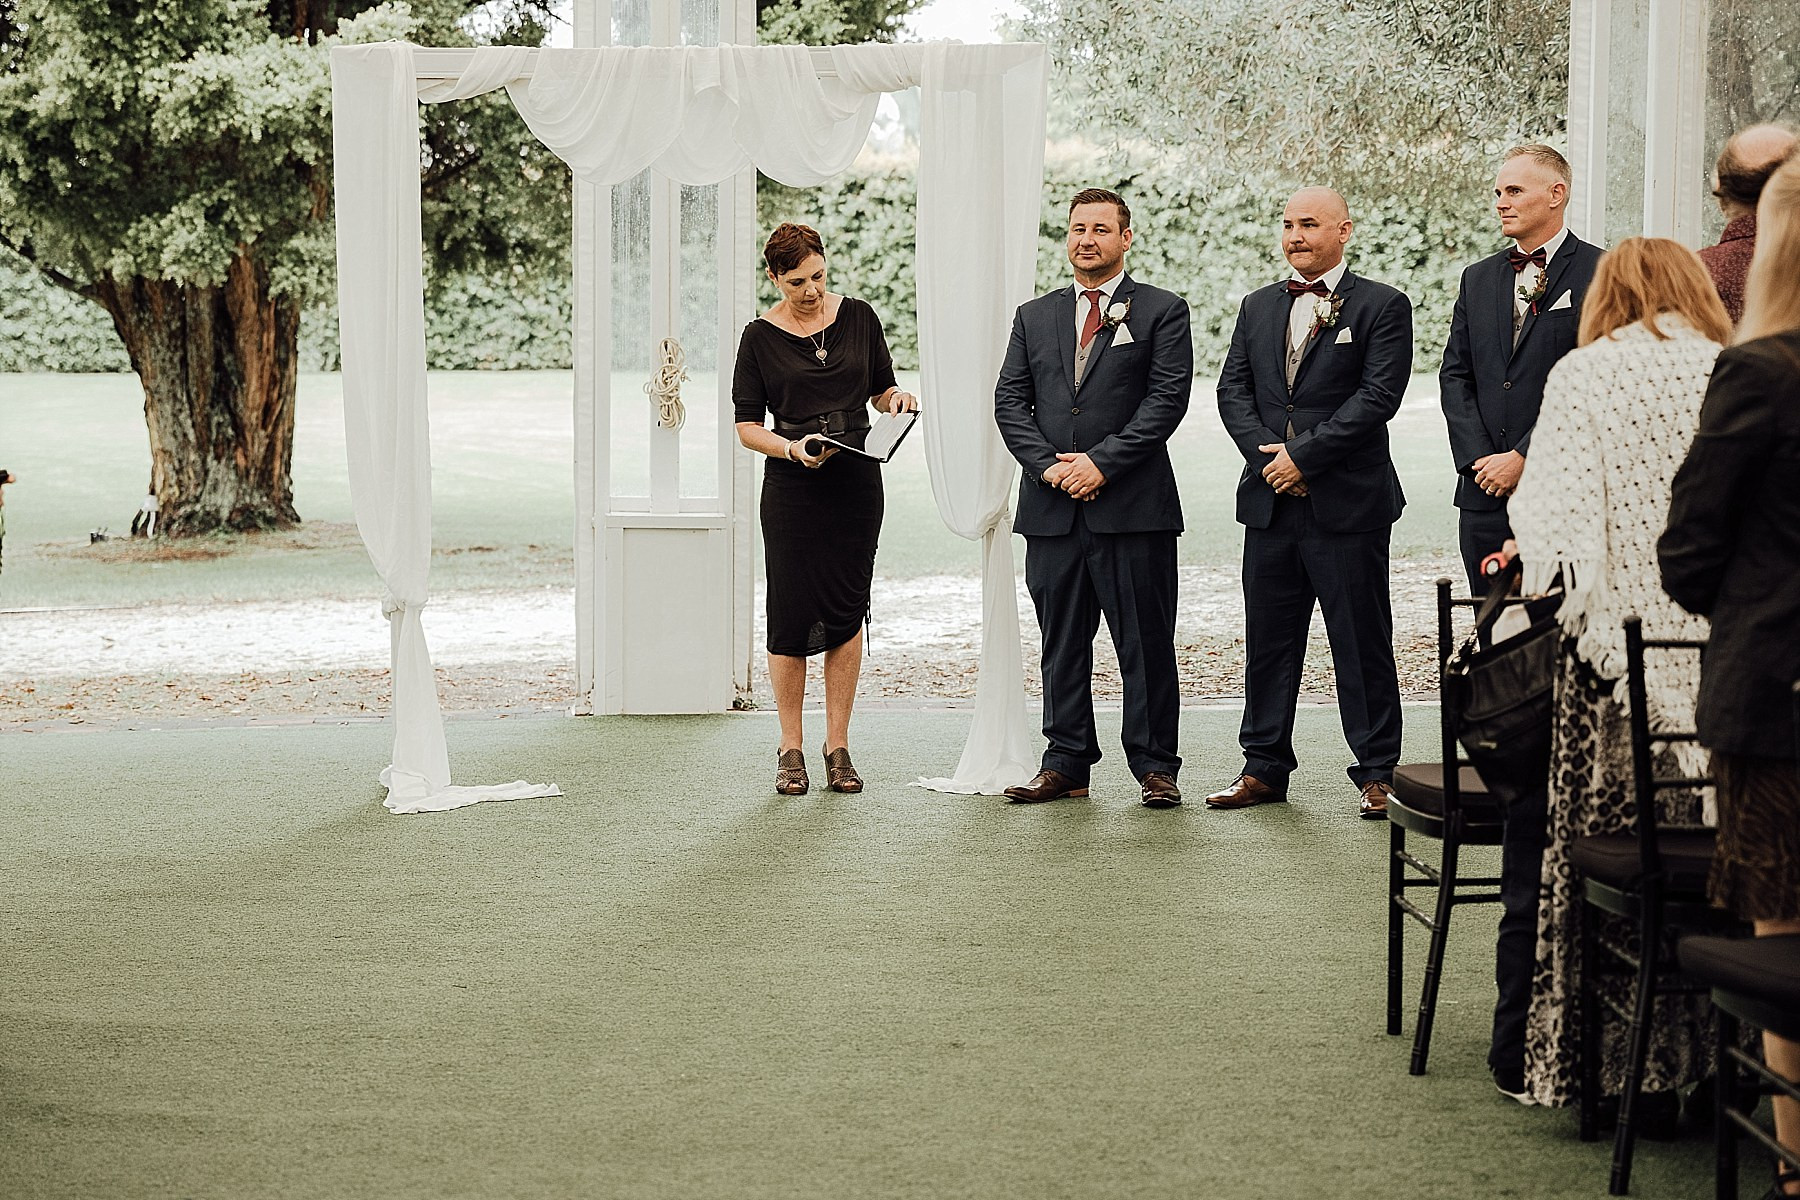 Allely Estate Wedding Auckland Wedding Photographer - Jana & Laurie_0110.jpg